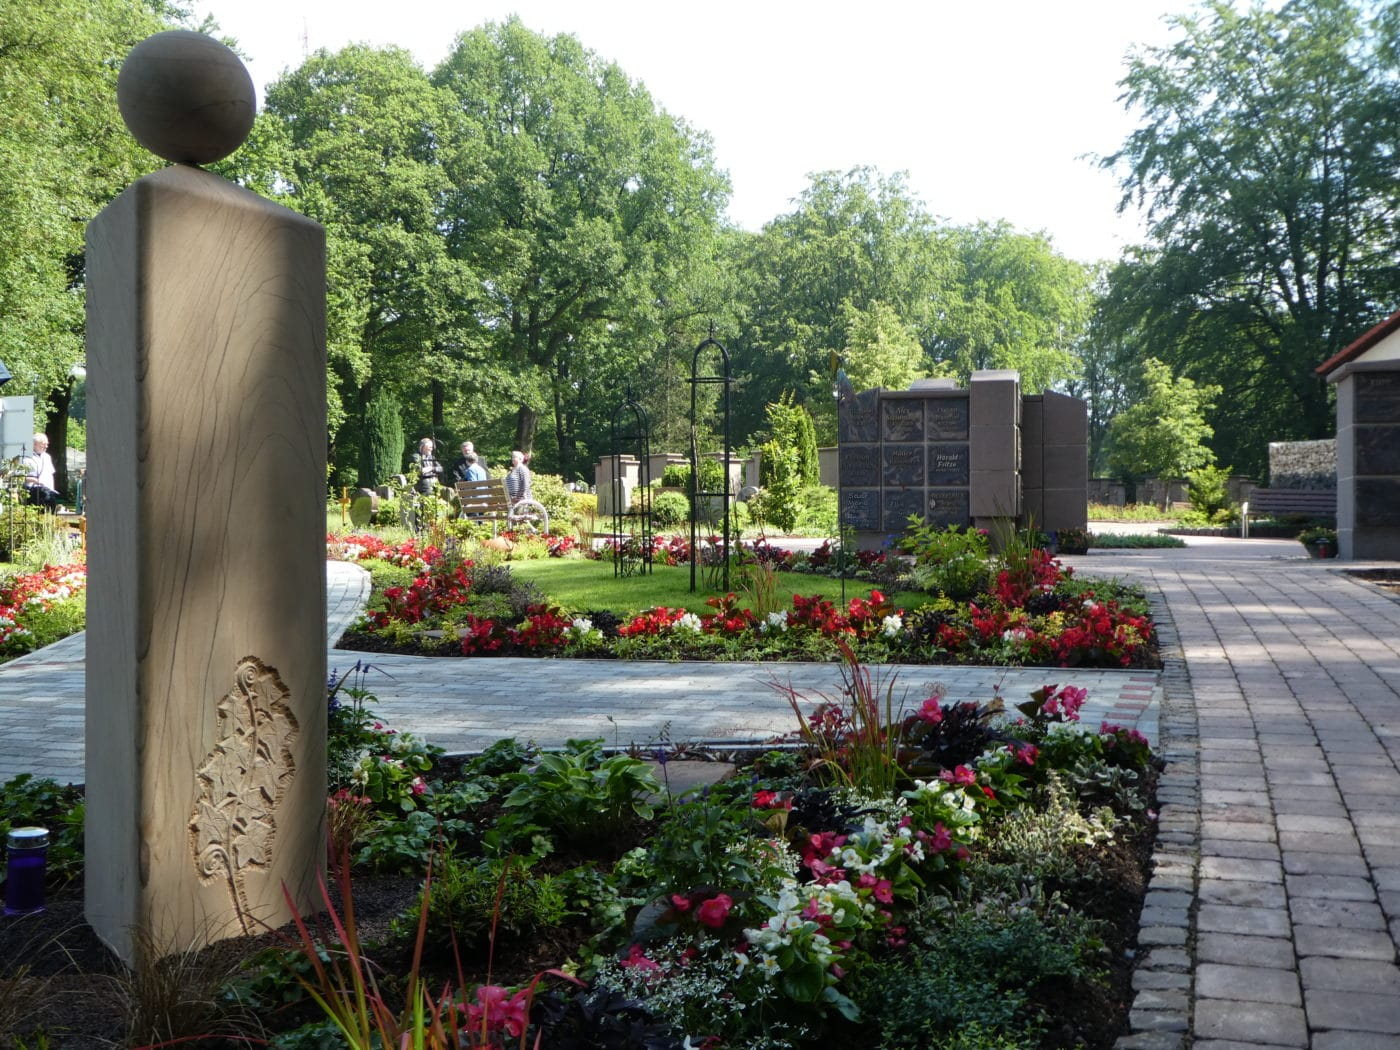 Memoriam-Garten, Stele